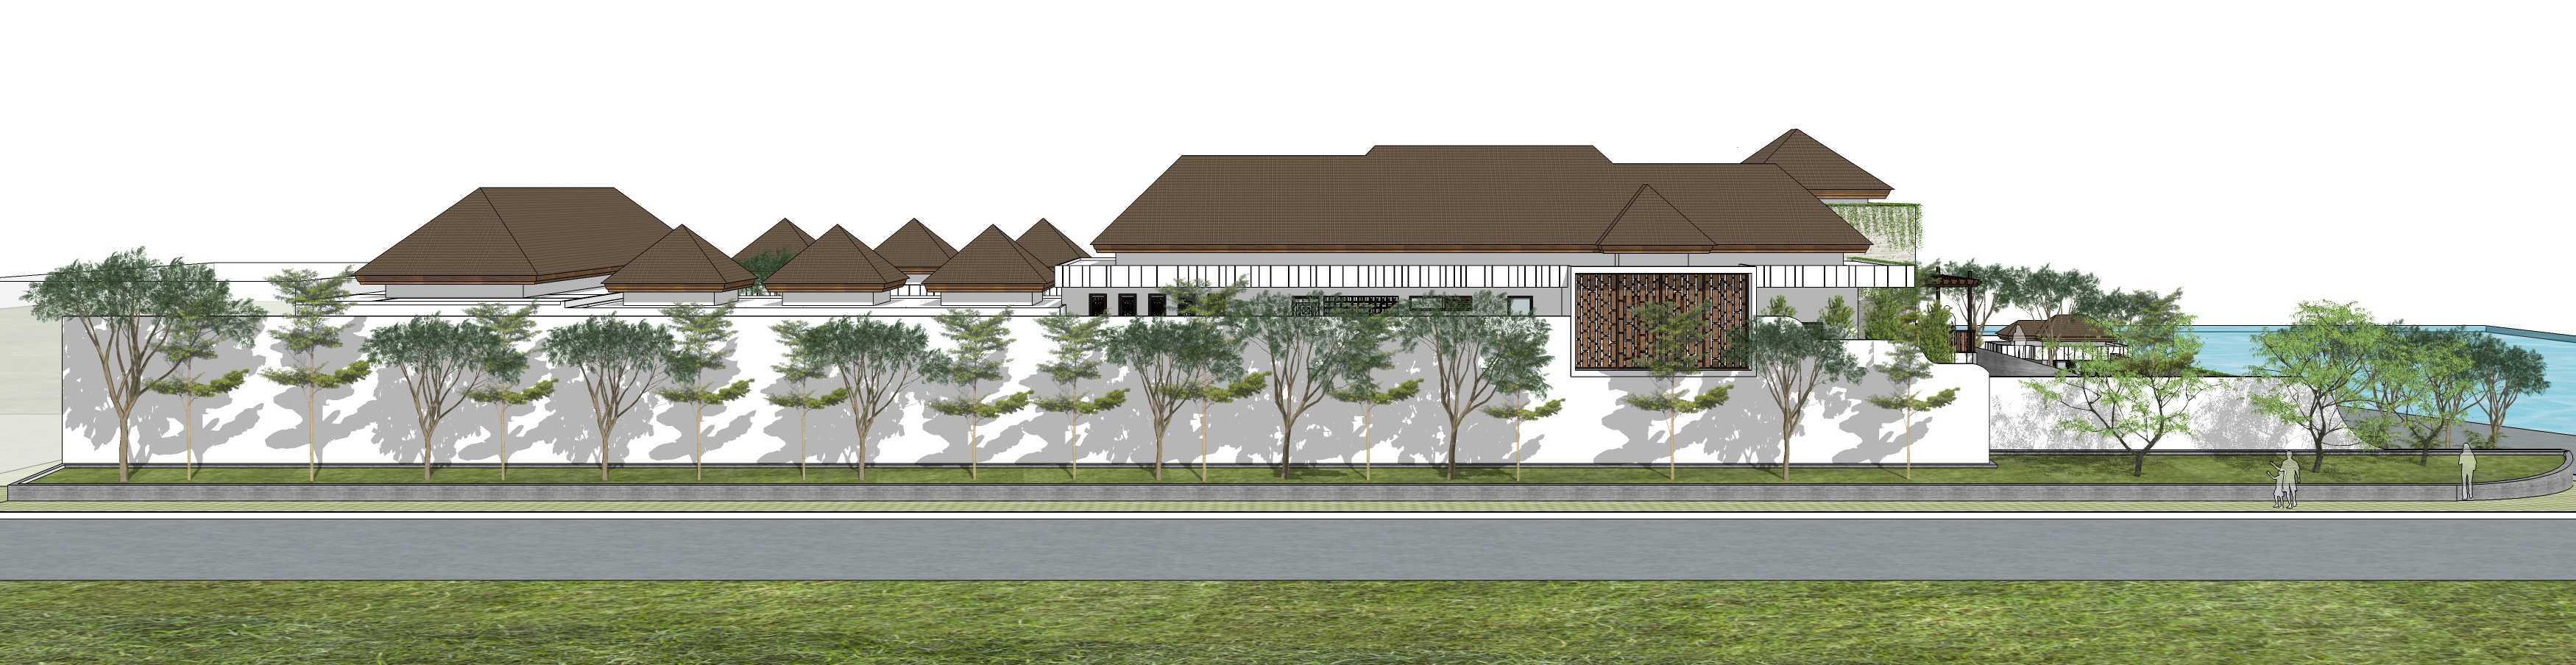 Miv Architects (Ar. Muhammad Ikhsan Hamiru, Iai & Partners) Rumah Sore  Soreang, Pare-Pare City, South Sulawesi, Indonesia Soreang, Pare-Pare City, South Sulawesi, Indonesia 5 Tropis  33946